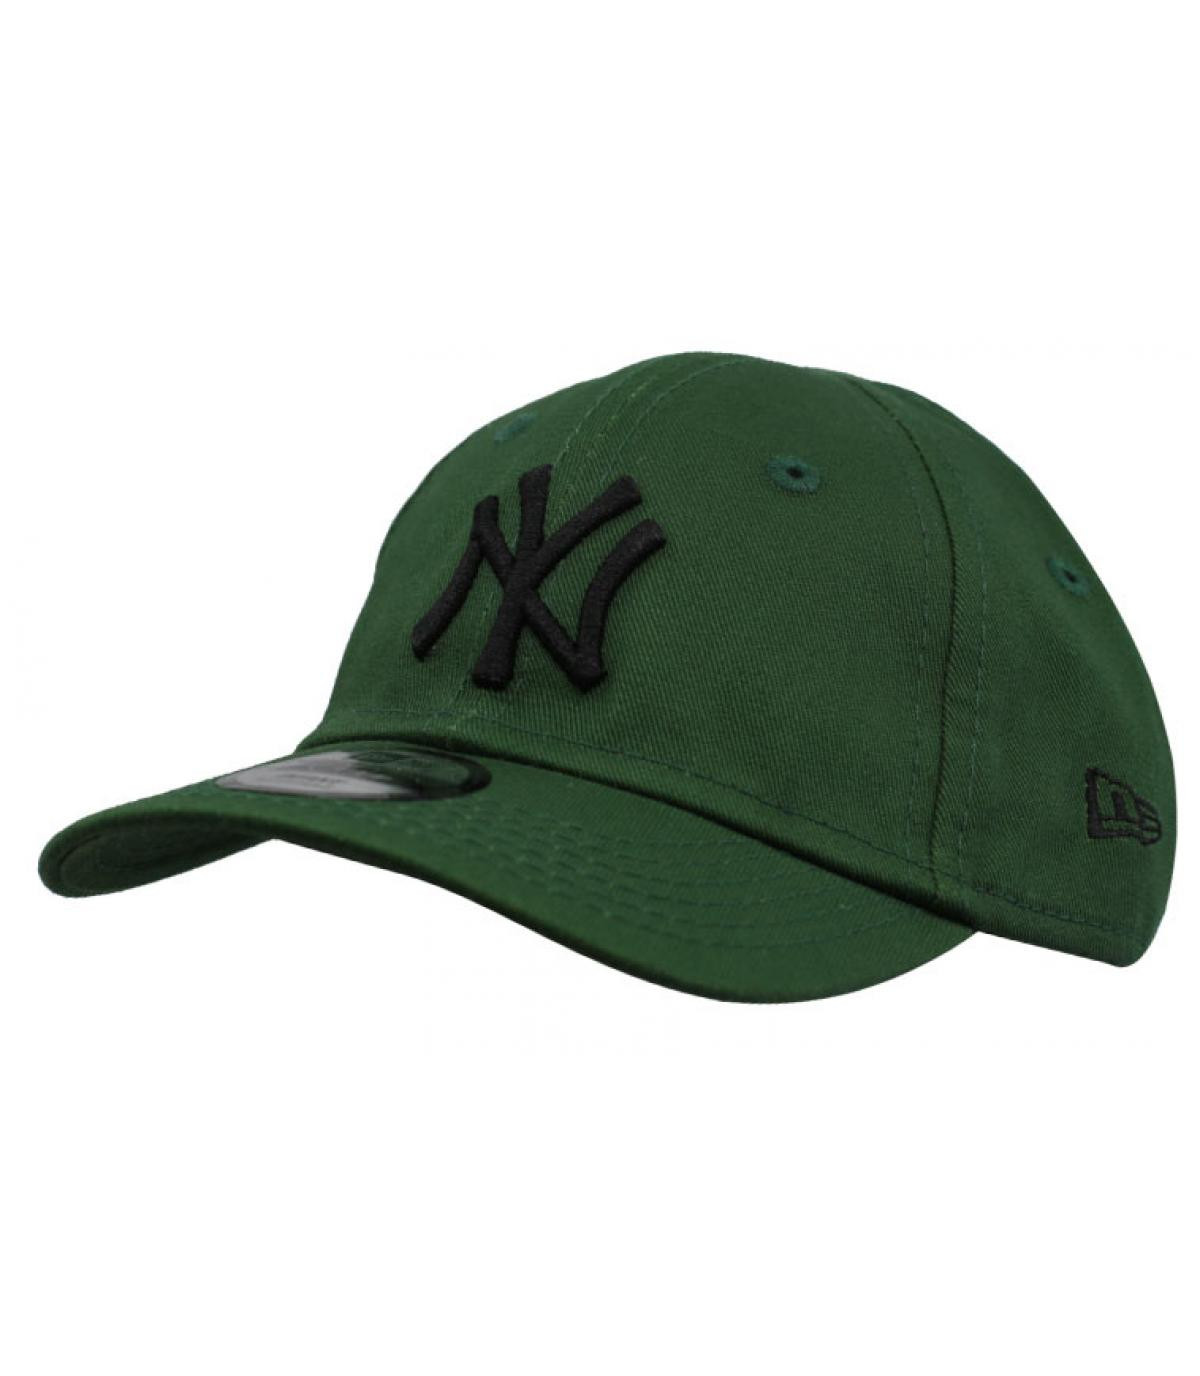 Details Baby Cap League Ess NY green black - Abbildung 2